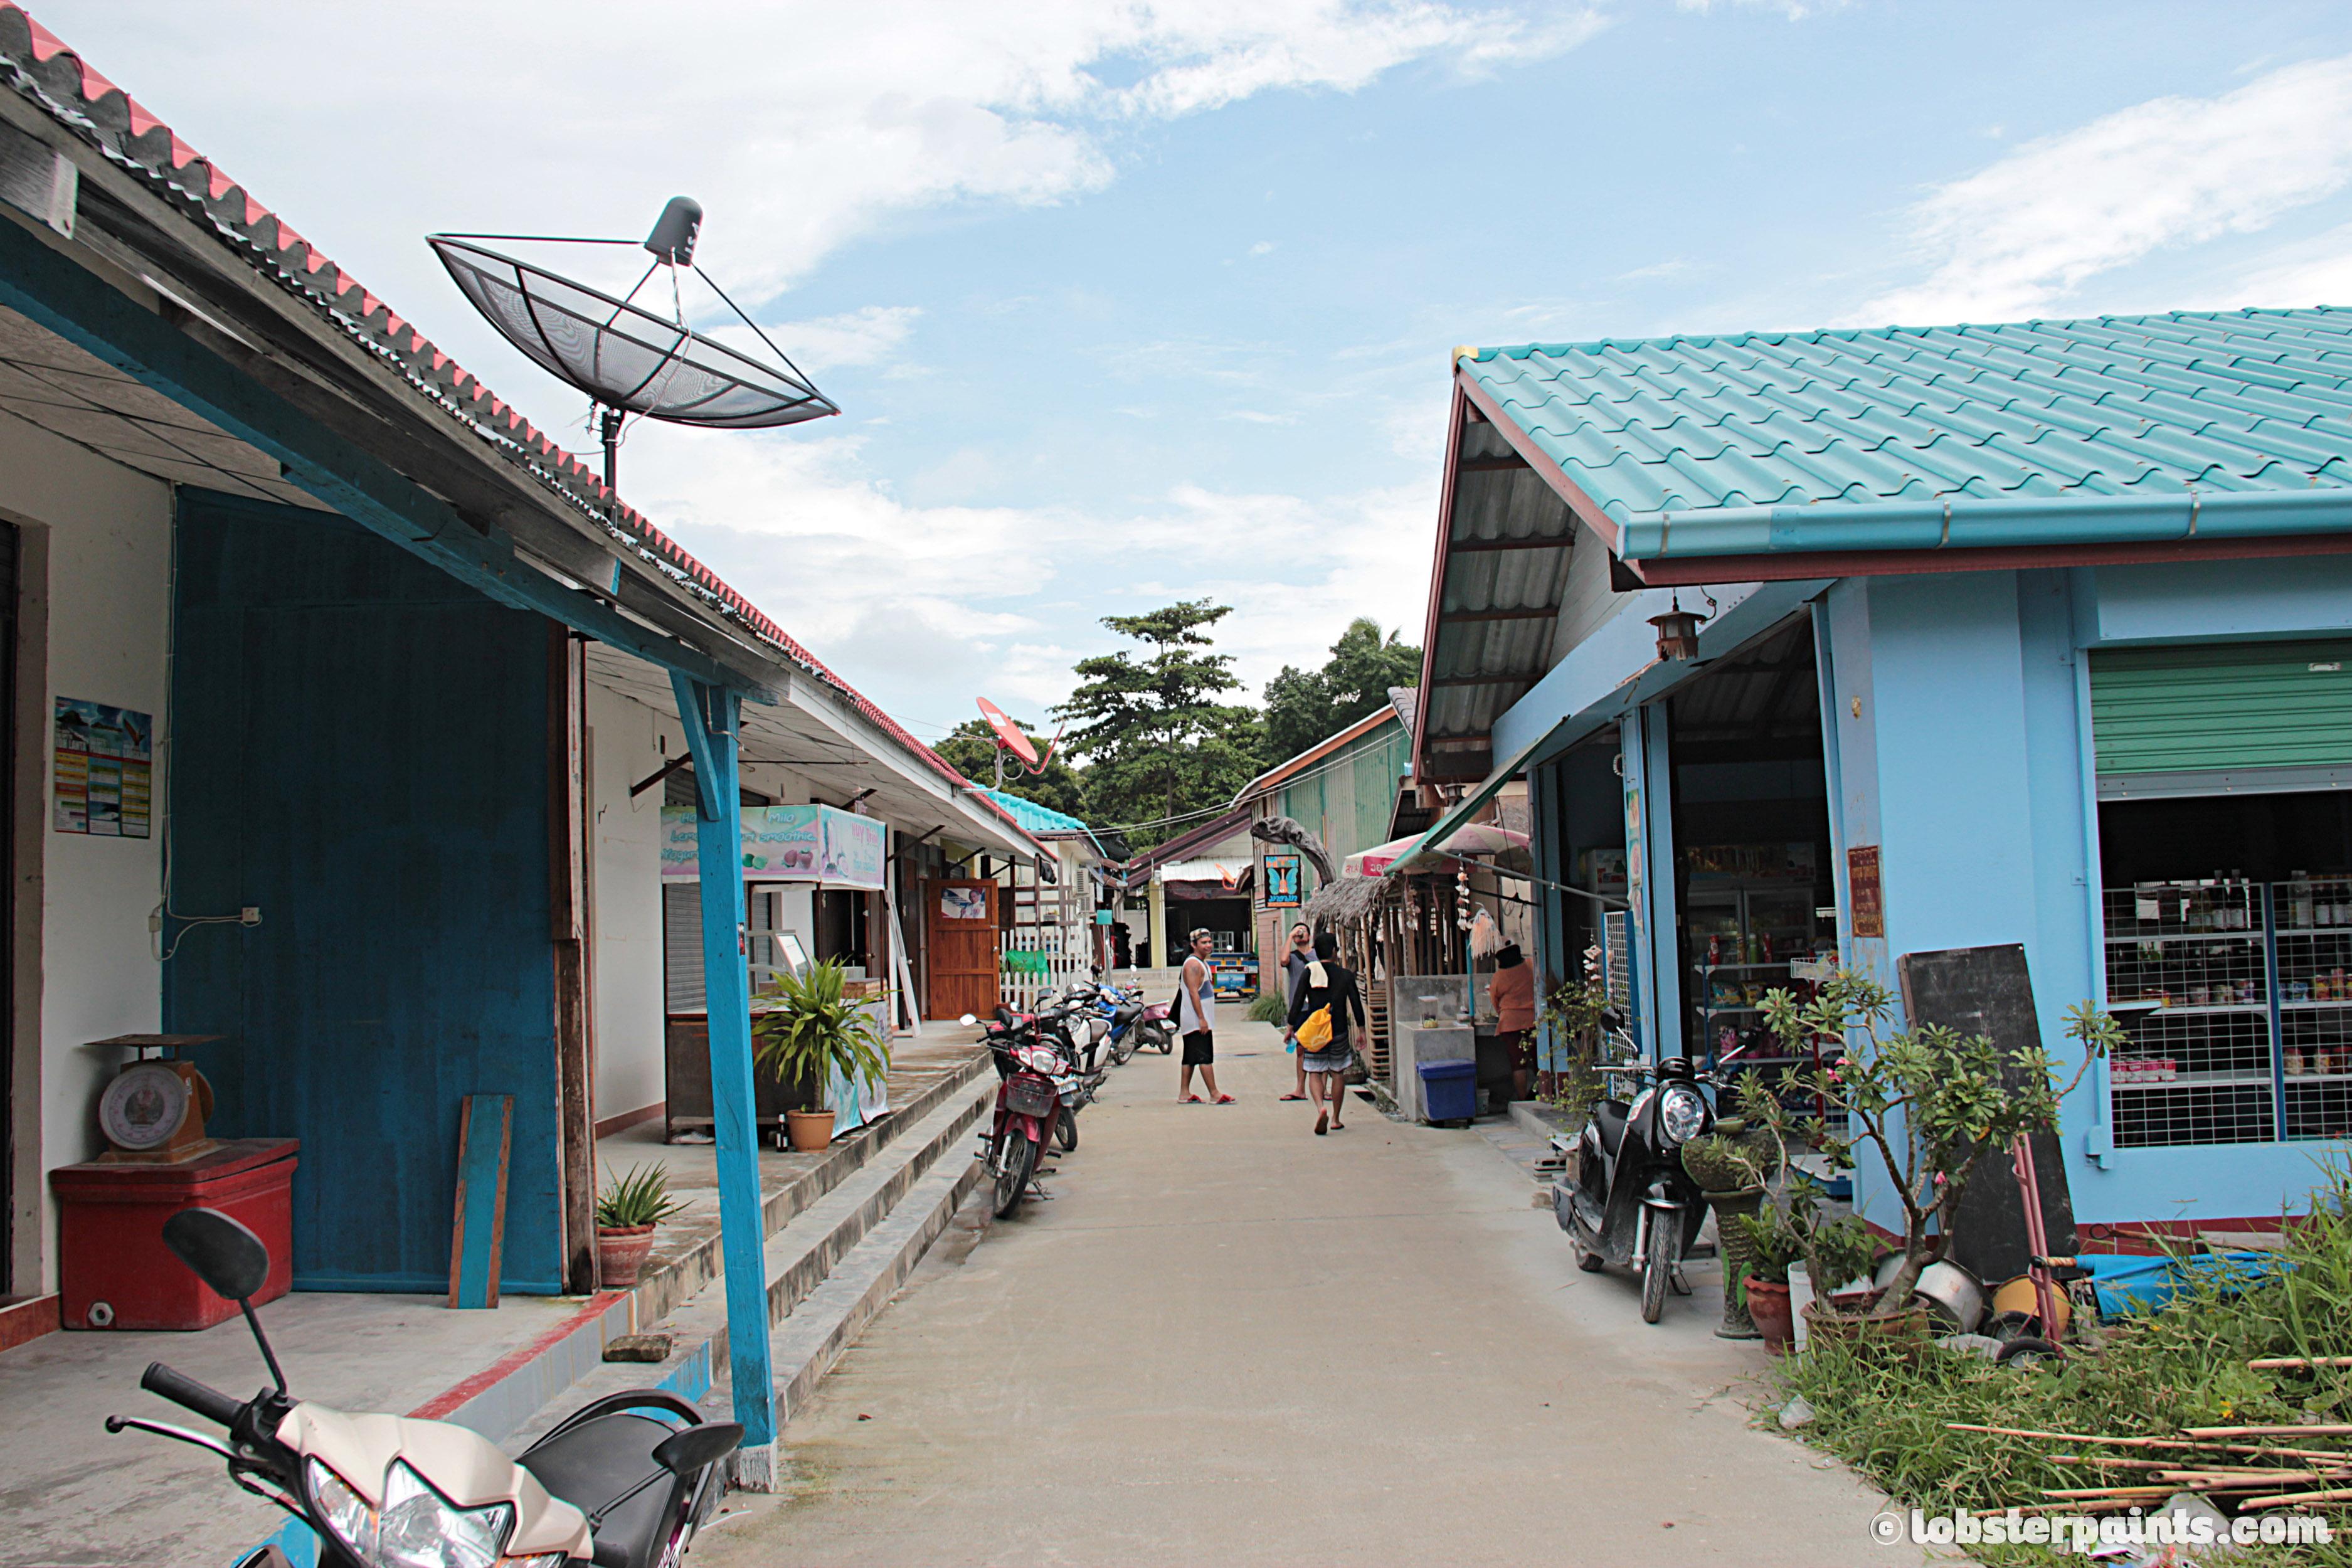 Town | Koh Lipe, Thailand